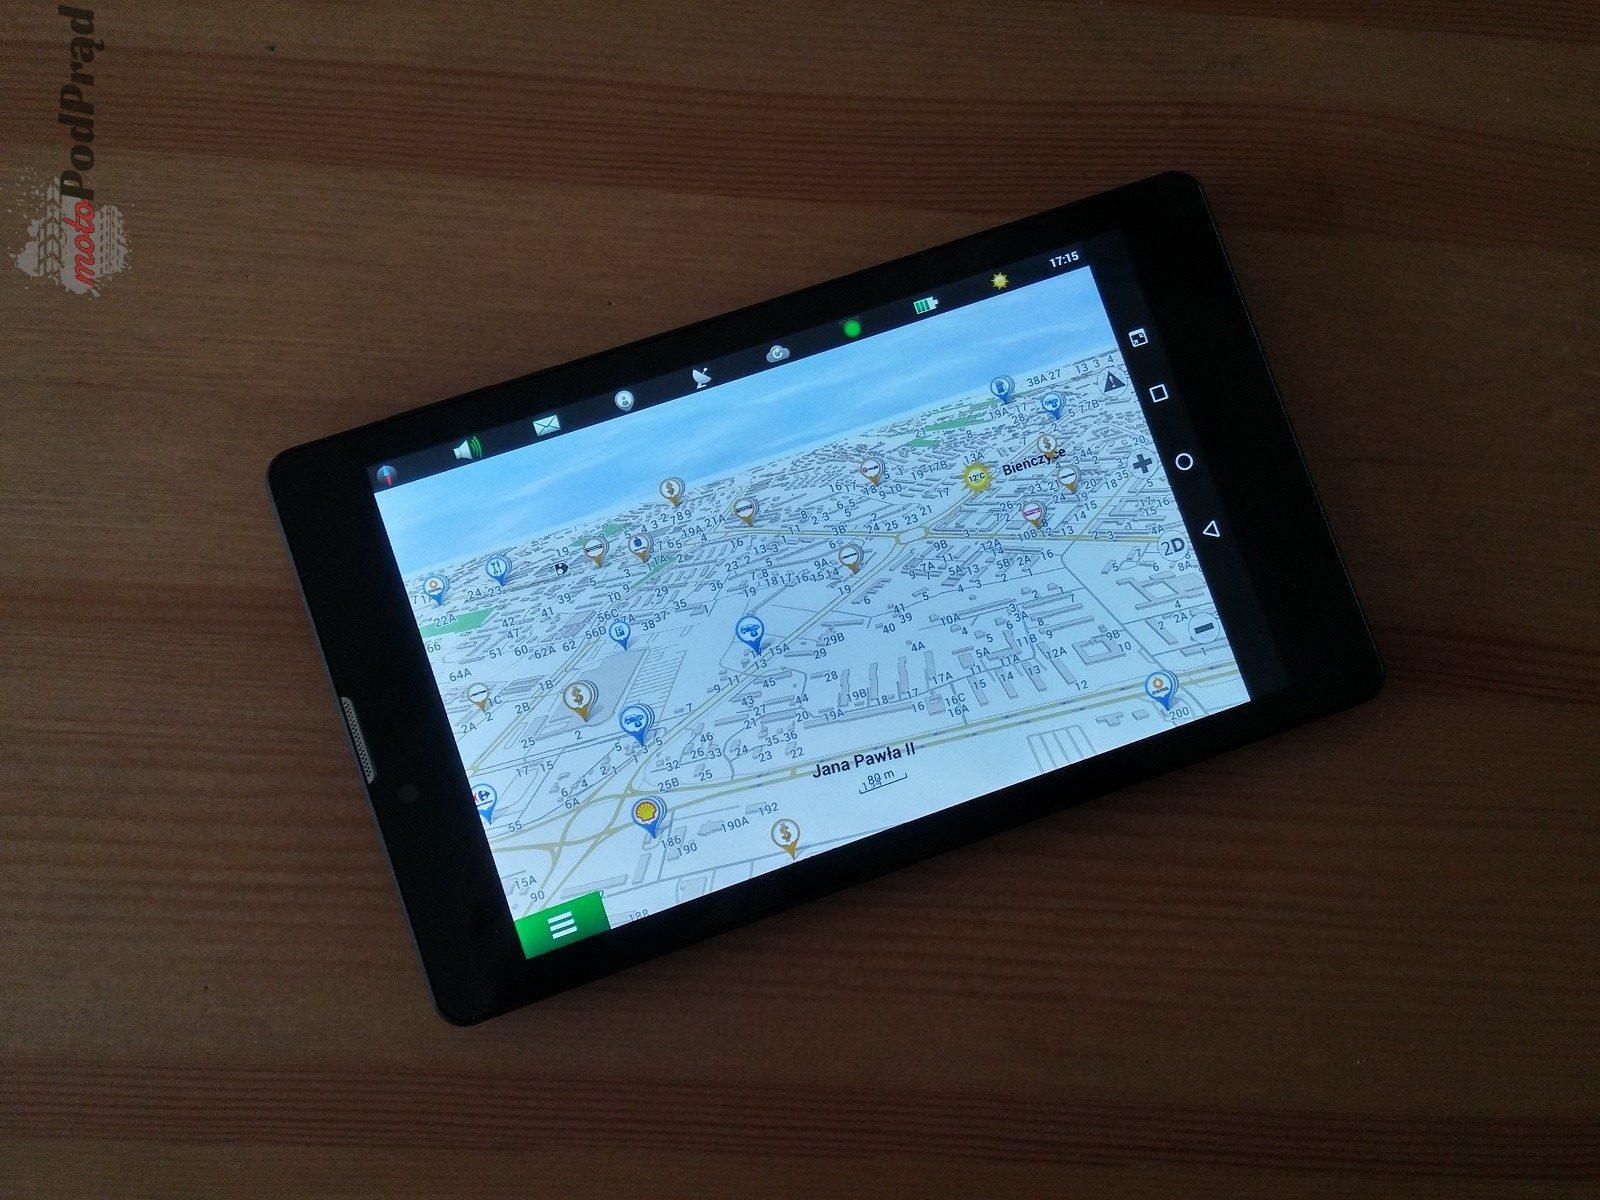 20171004 171552 HDR e1507721218376 Tablet jako nawigacja? Navitel T500 3G